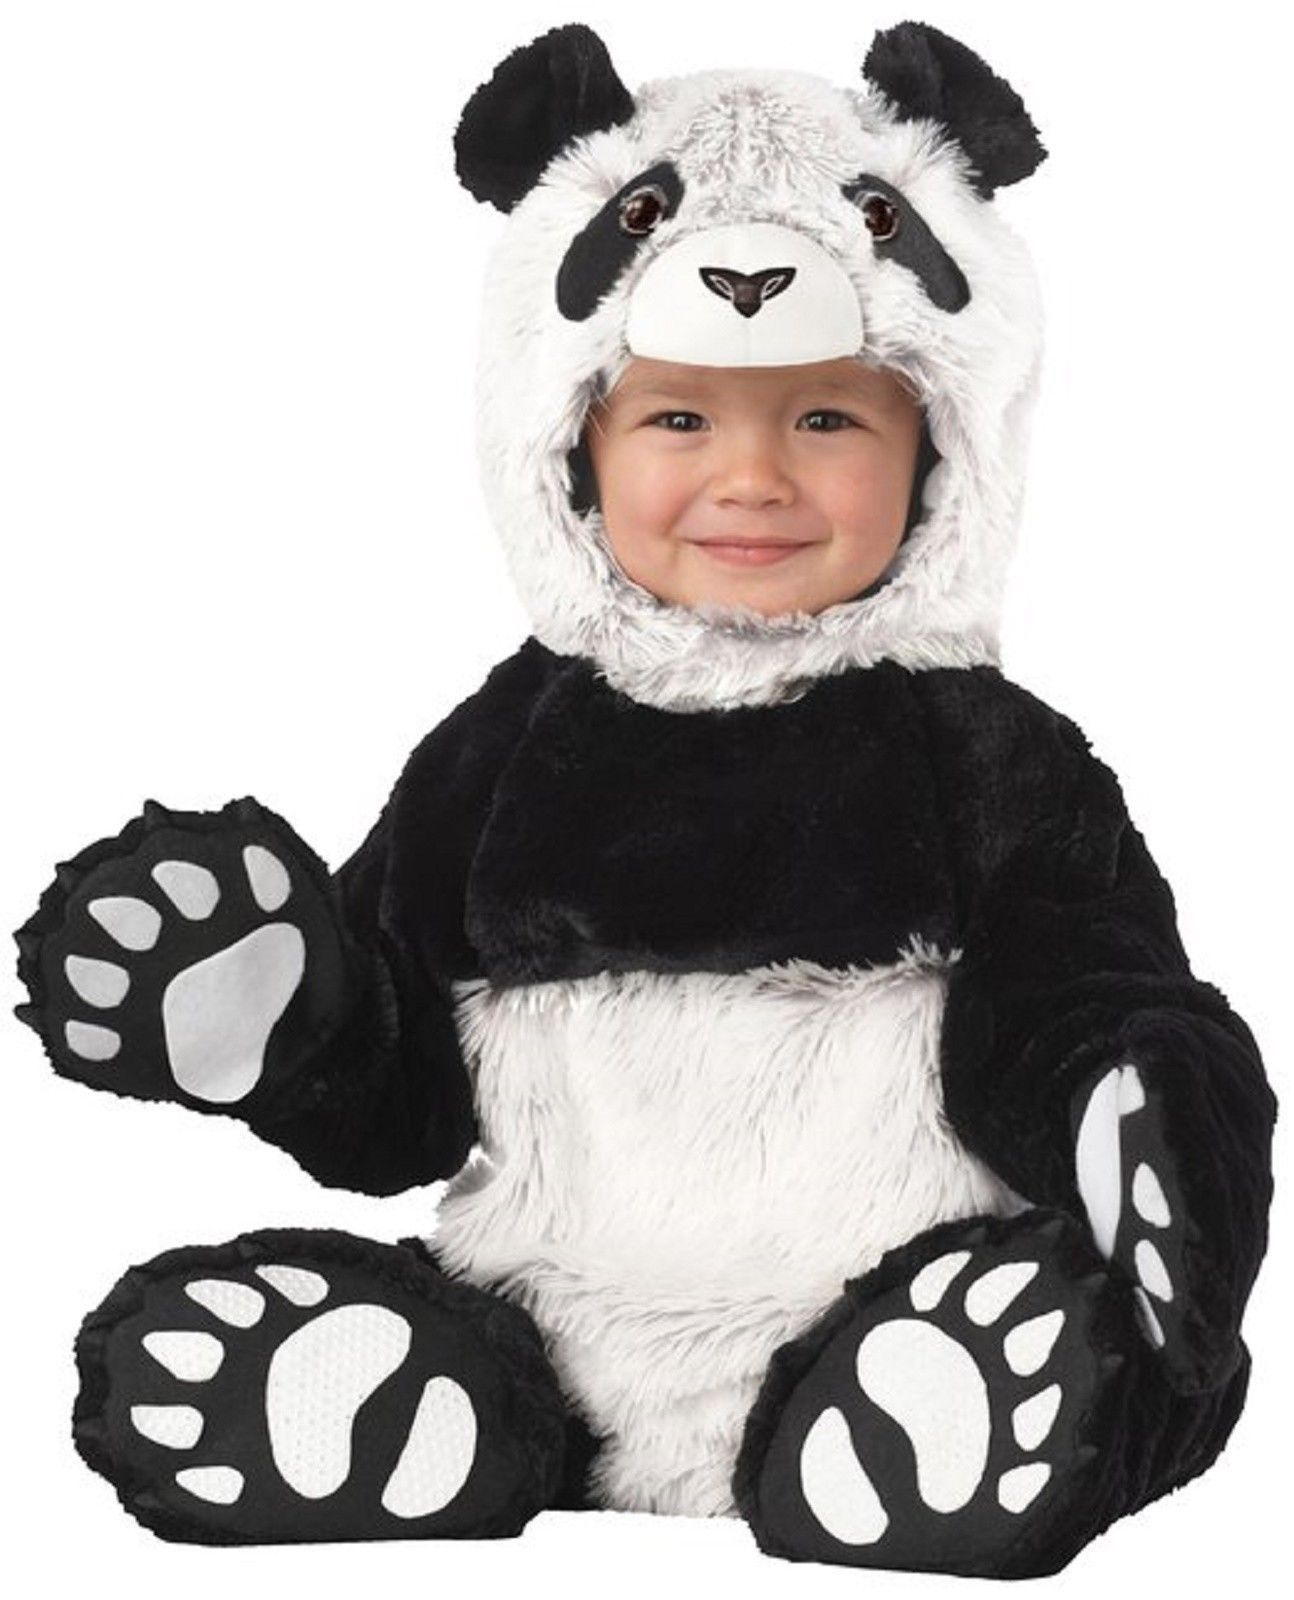 Kids Costumes Jungle Animal Panda Bear Toddler Infant Costume BUY IT NOW ONLY $49.88  sc 1 st  Pinterest & Kids Costumes: Jungle Animal Panda Bear Toddler Infant Costume BUY ...